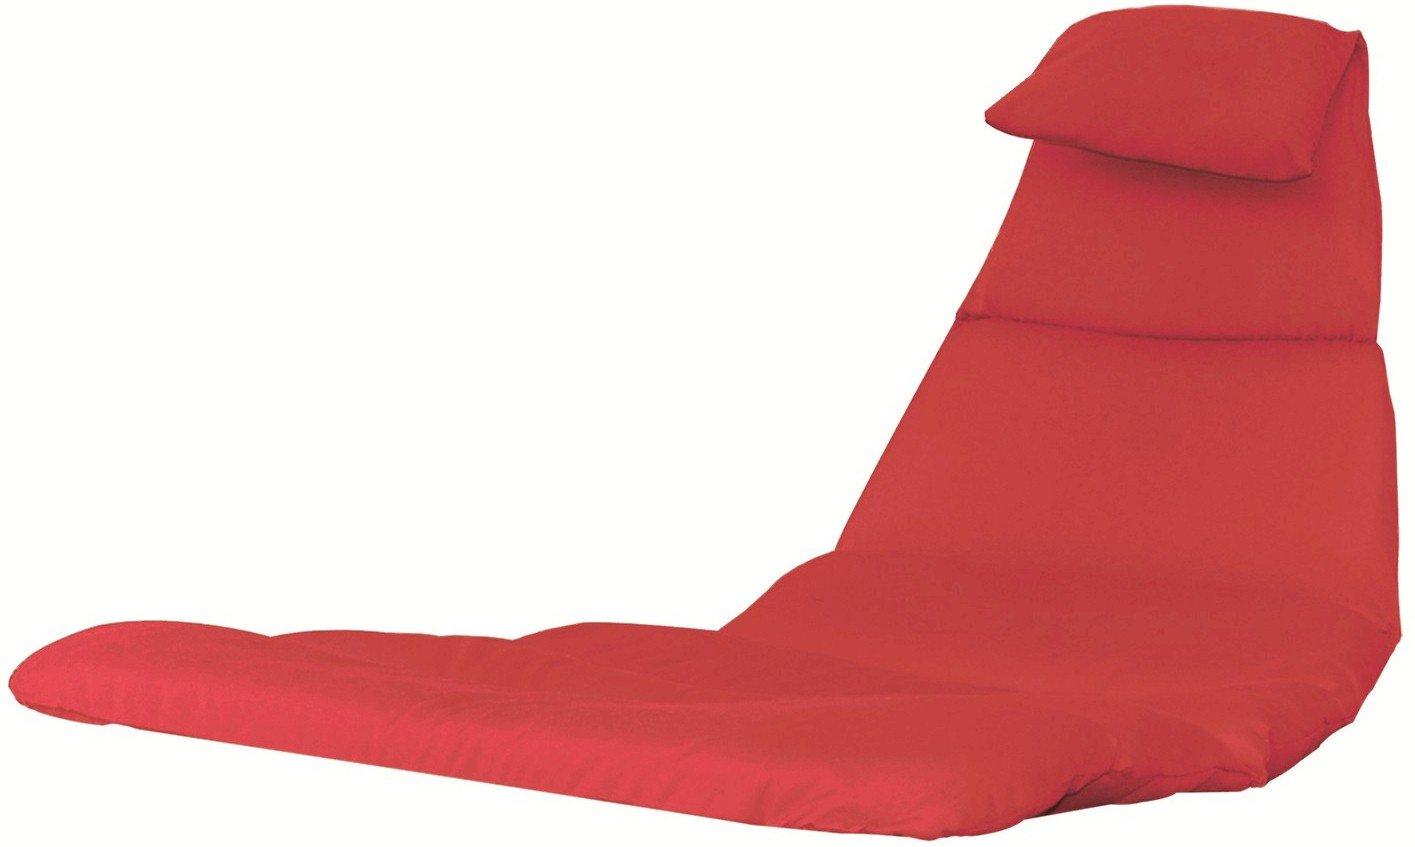 Vivere Dream Series Furniture Cushion, Cherry Red